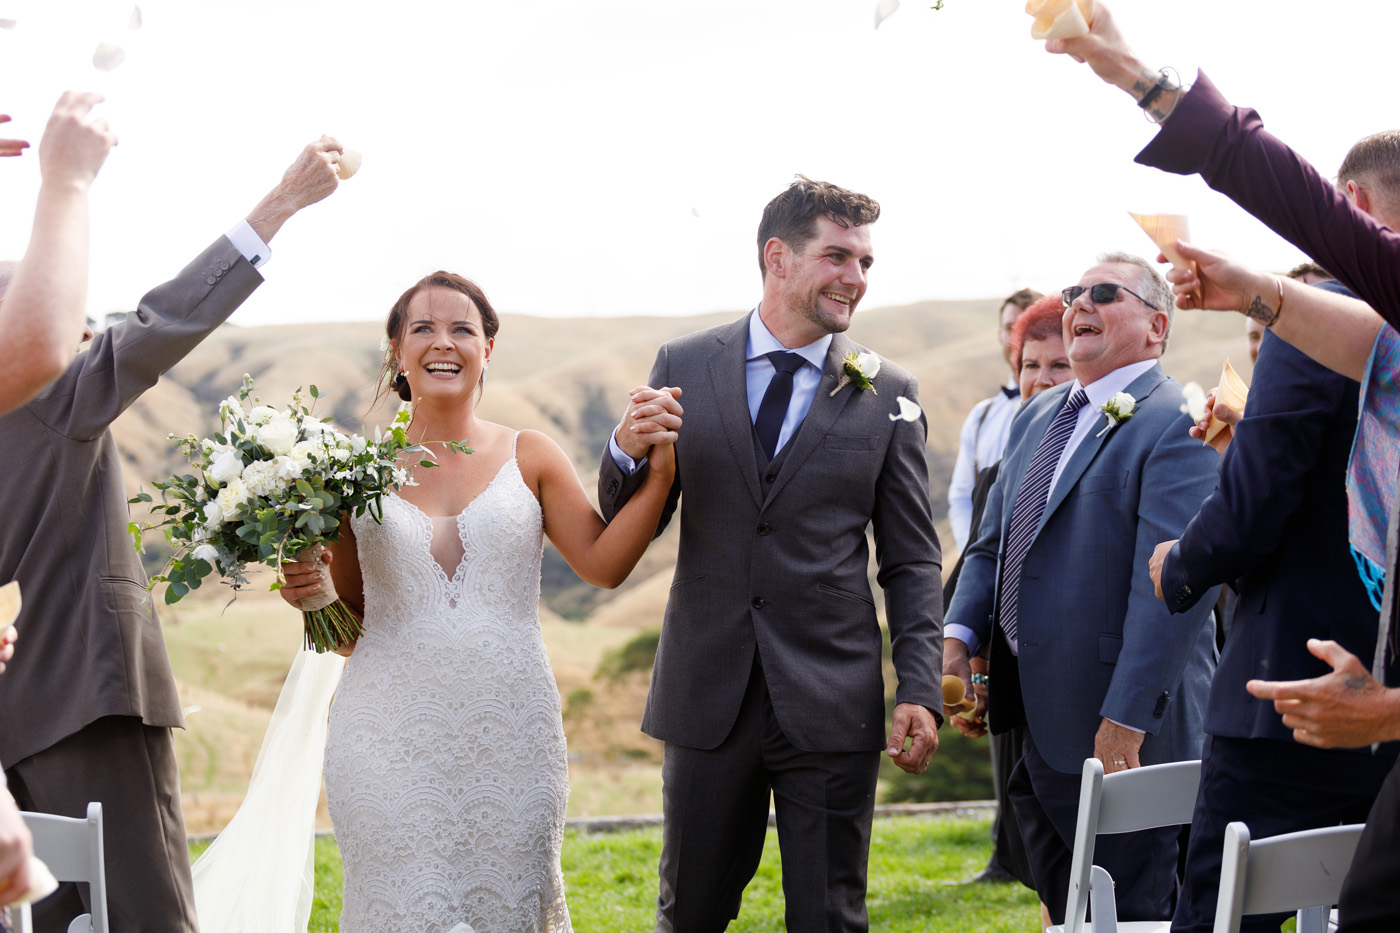 Danielle + Caylem | Raffaele Ciuca Real Bride | Real Wedding | New Zealand Wedding | Mietra by Maggie Sottero